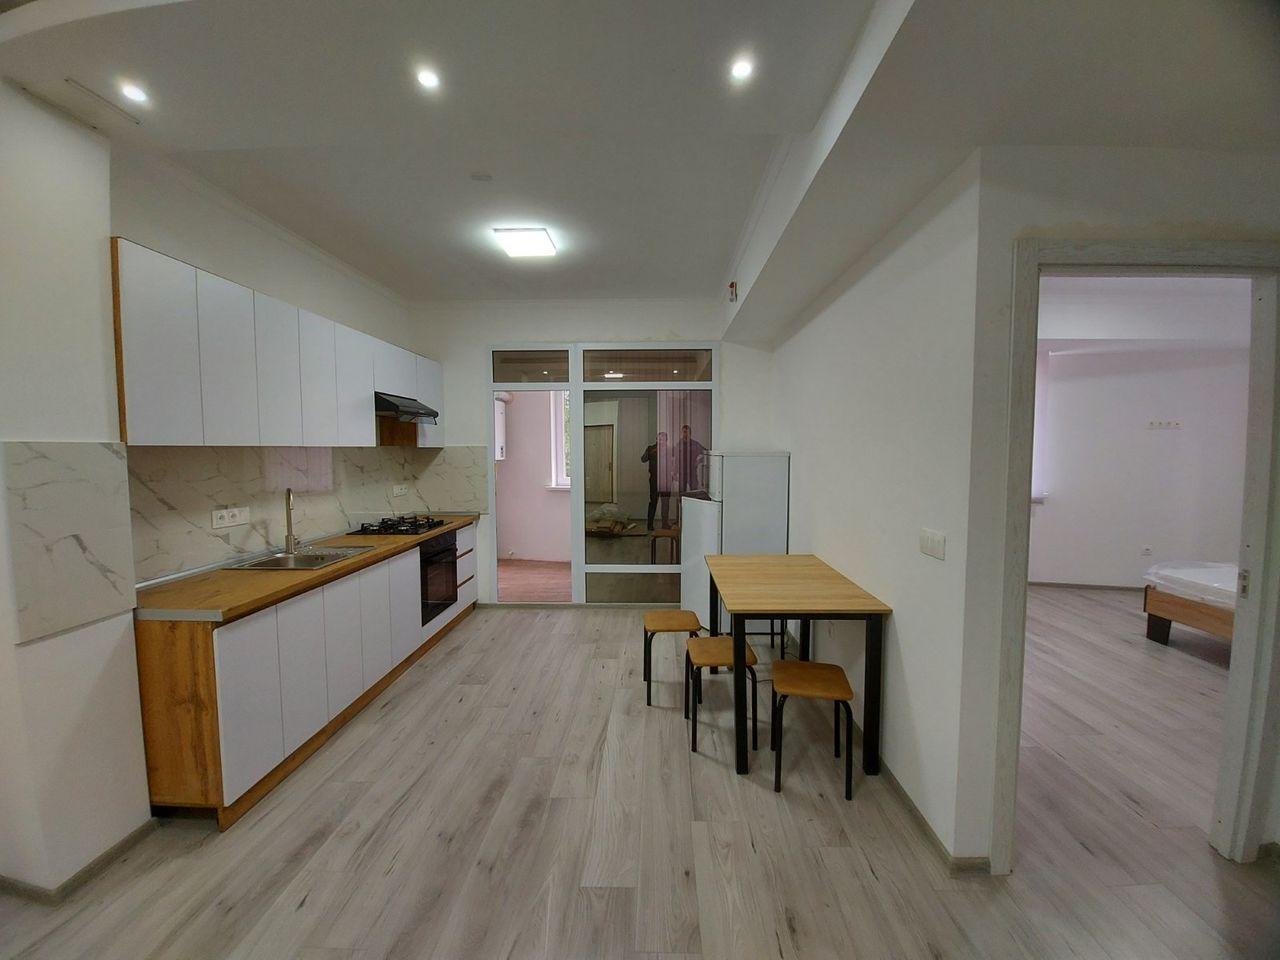 Urgent spre Chirie apartament cu 2 camere 66 m2 reparat mobilat